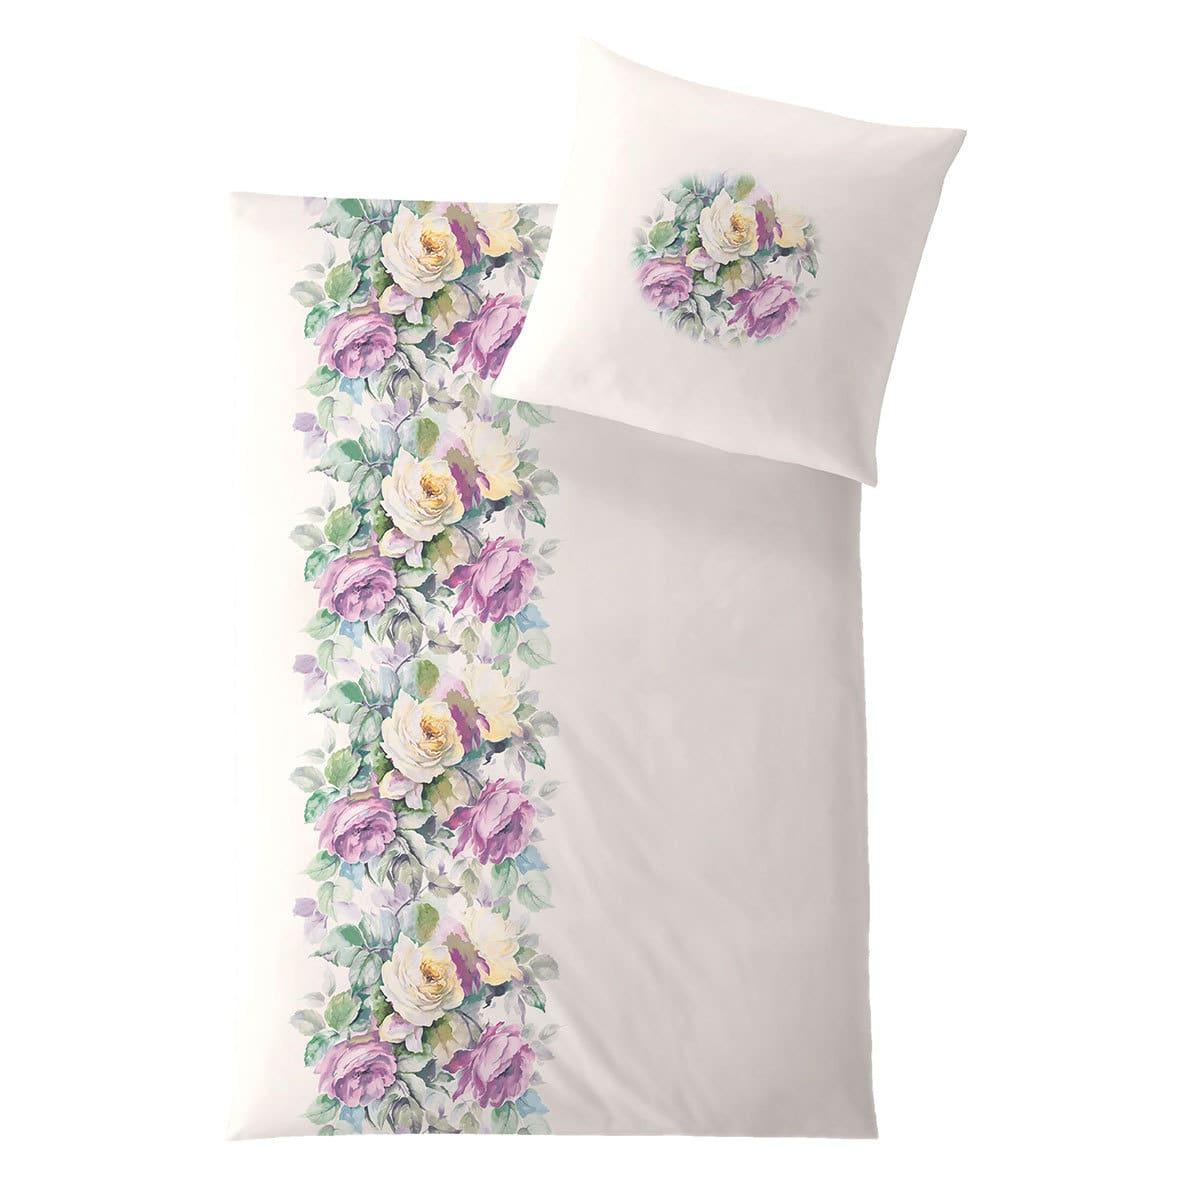 hefel tencel wendebettw sche pure luxury princess g nstig online kaufen bei bettwaren shop. Black Bedroom Furniture Sets. Home Design Ideas